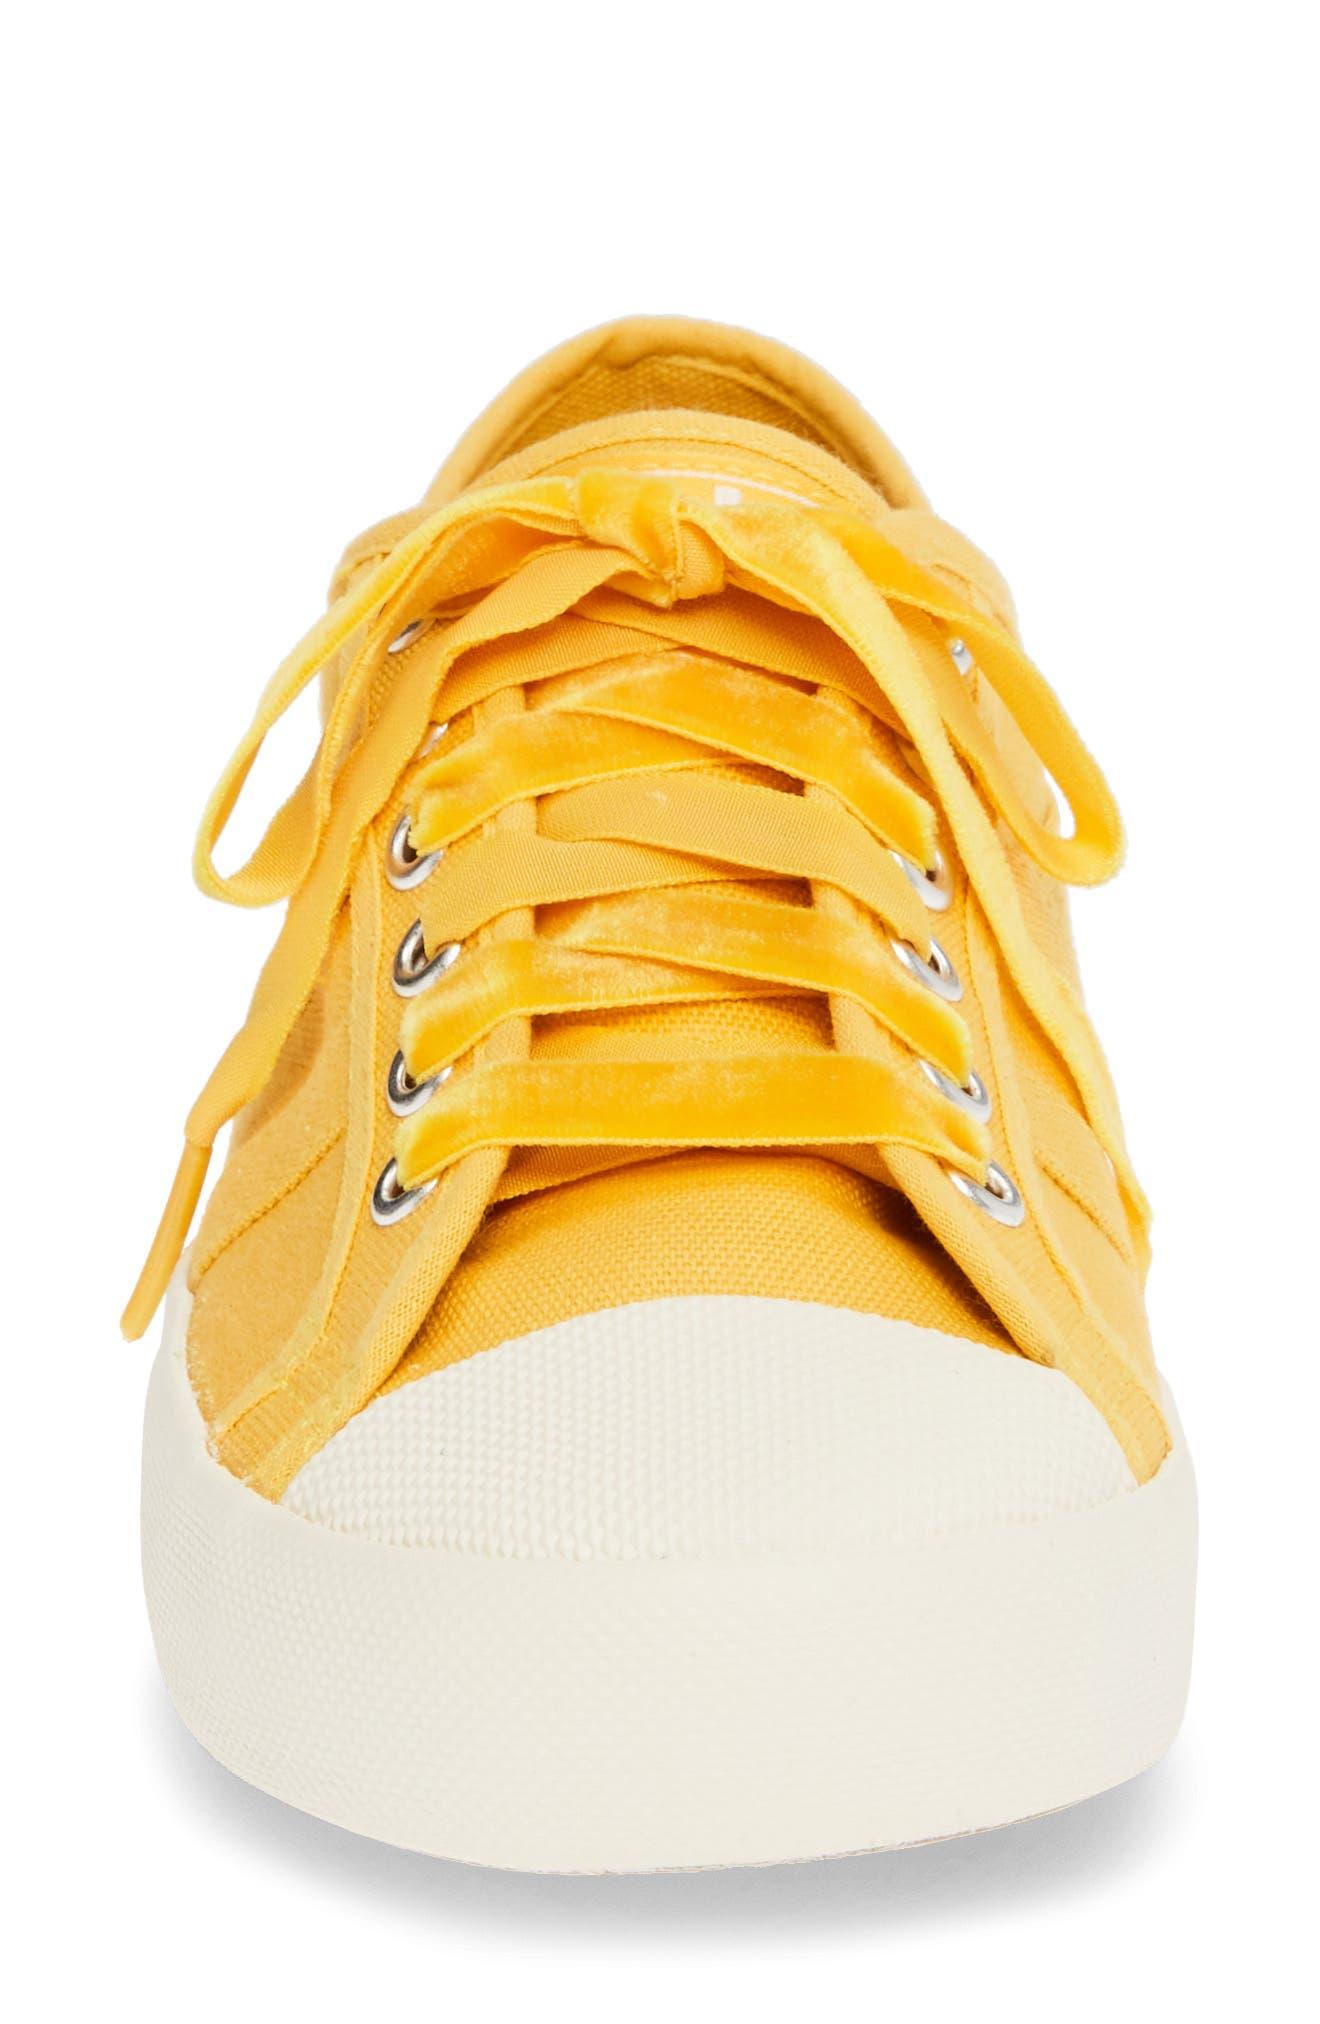 Coaster Sneaker,                             Alternate thumbnail 4, color,                             SUN/ OFF WHITE